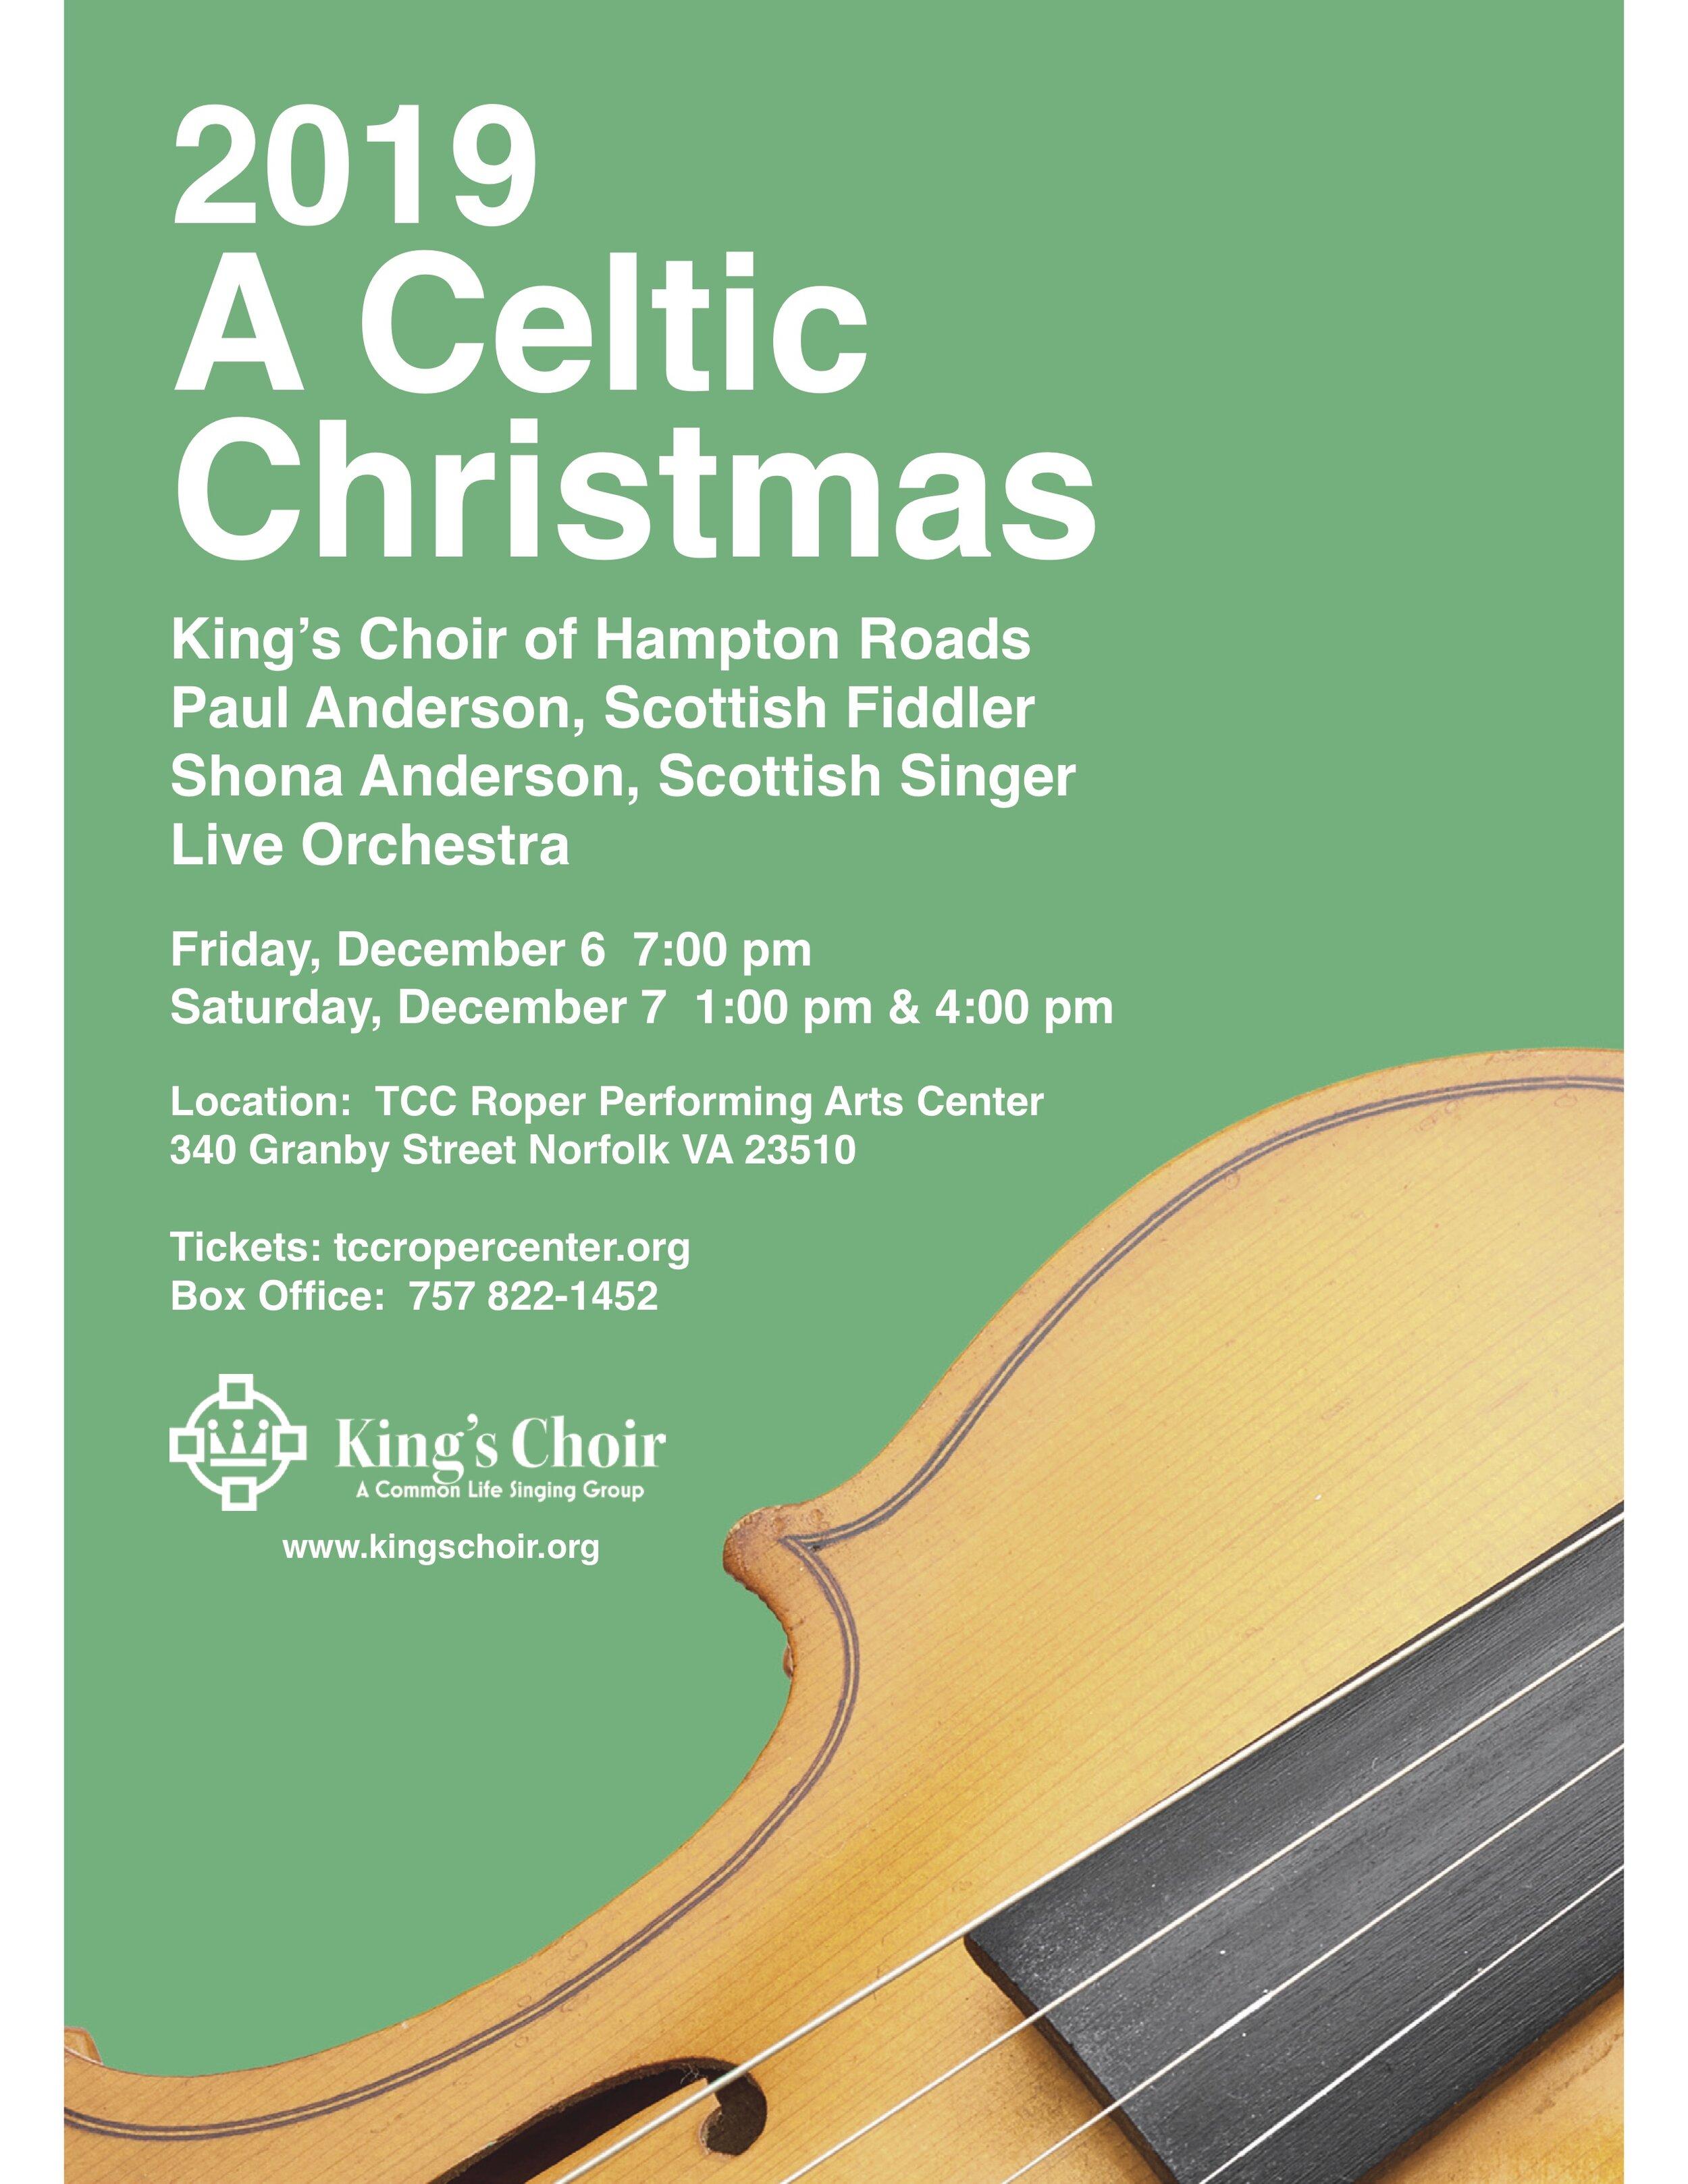 Saturday, December 7 @ 4:00 pm  TCC Roper Performing Arts Center  340 Granby Street Norfolk 23510  tcropercenter.org/757.822.1452 Box Office